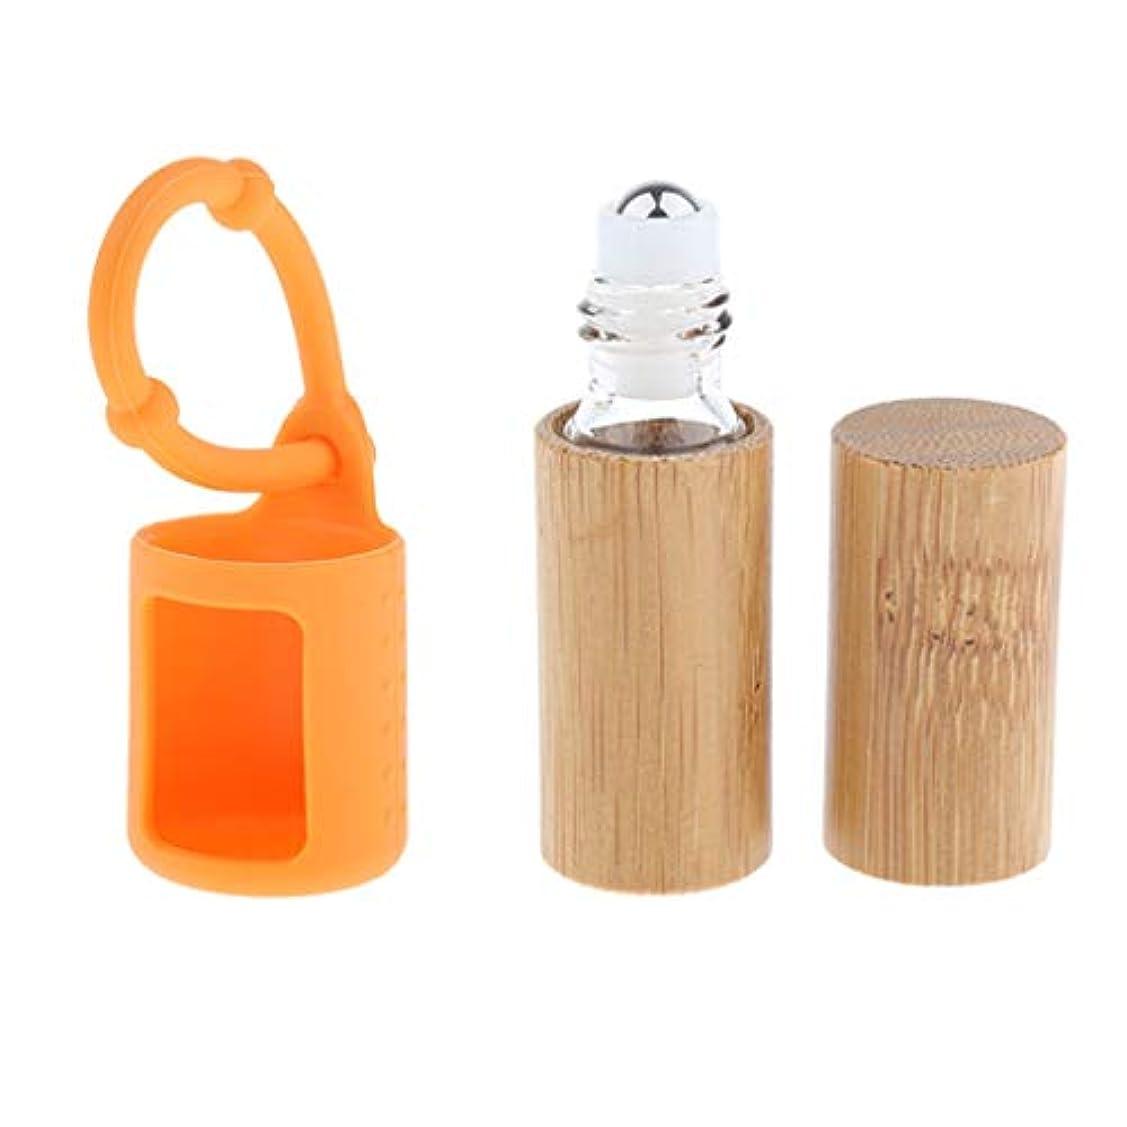 D DOLITY 竹ボトル エッセンシャルオイル 香水 オイル 精油瓶 詰め替え 5ミリ 吊り掛けバッグ付